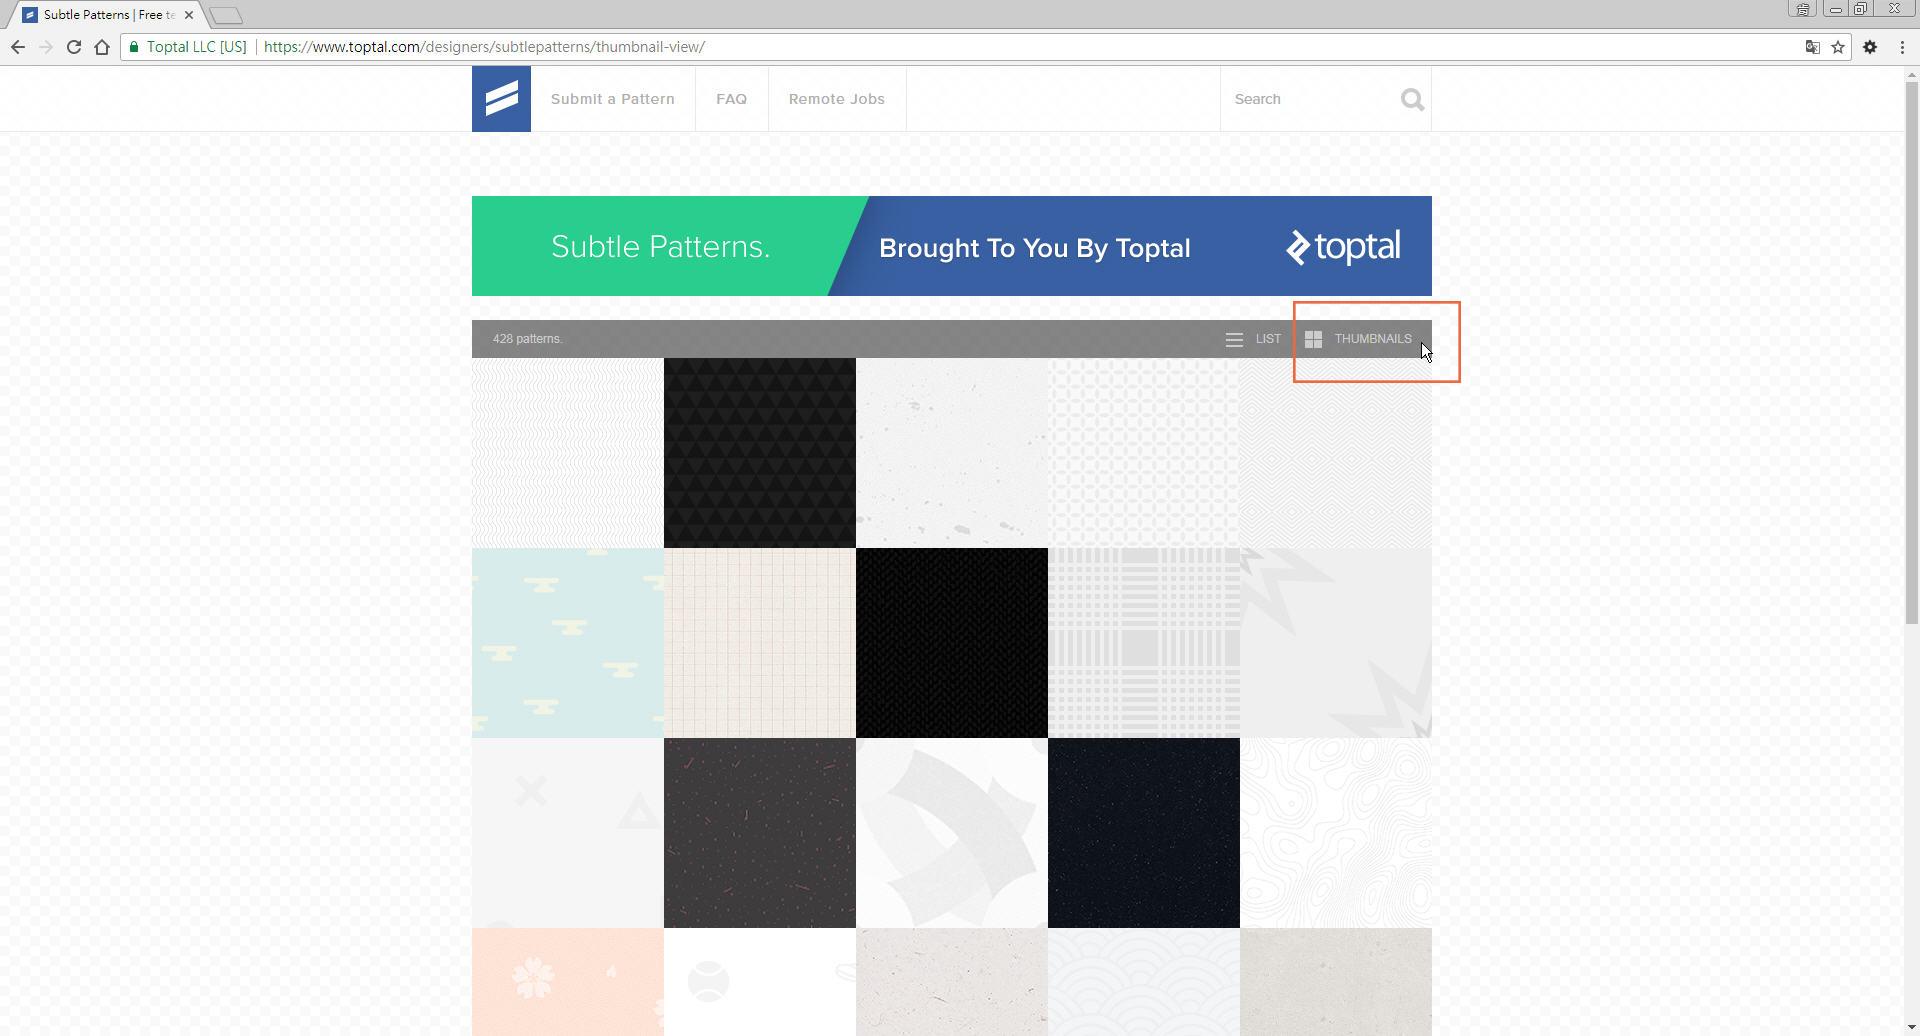 Free Resource 好康報報 Good Design 好站報報  - 【設計資源】Subtle Patterns - 免費下載之 pattern 素材網站 - p-4